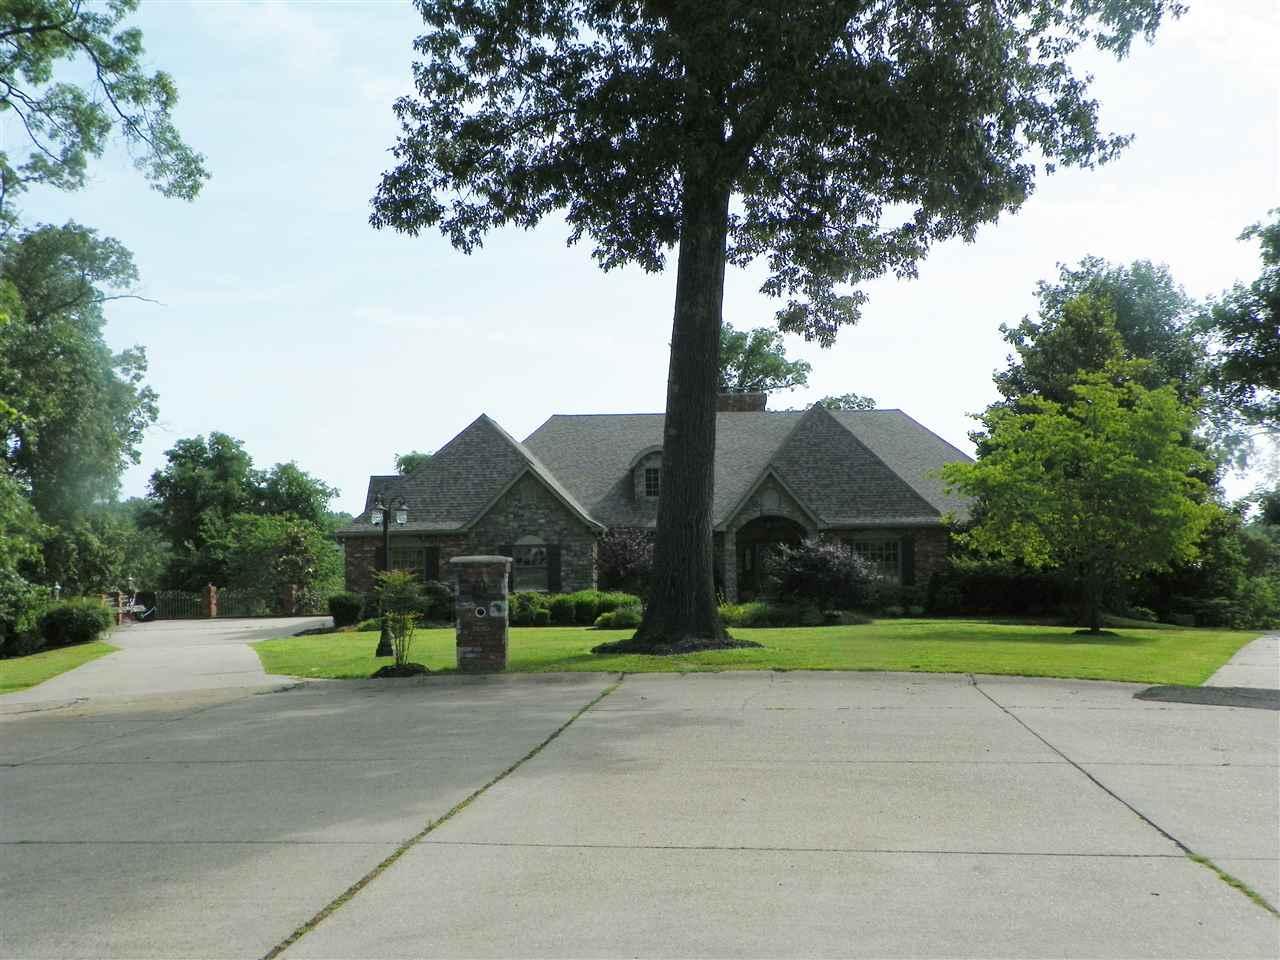 Real Estate for Sale, ListingId: 34009655, Poplar Bluff,MO63901